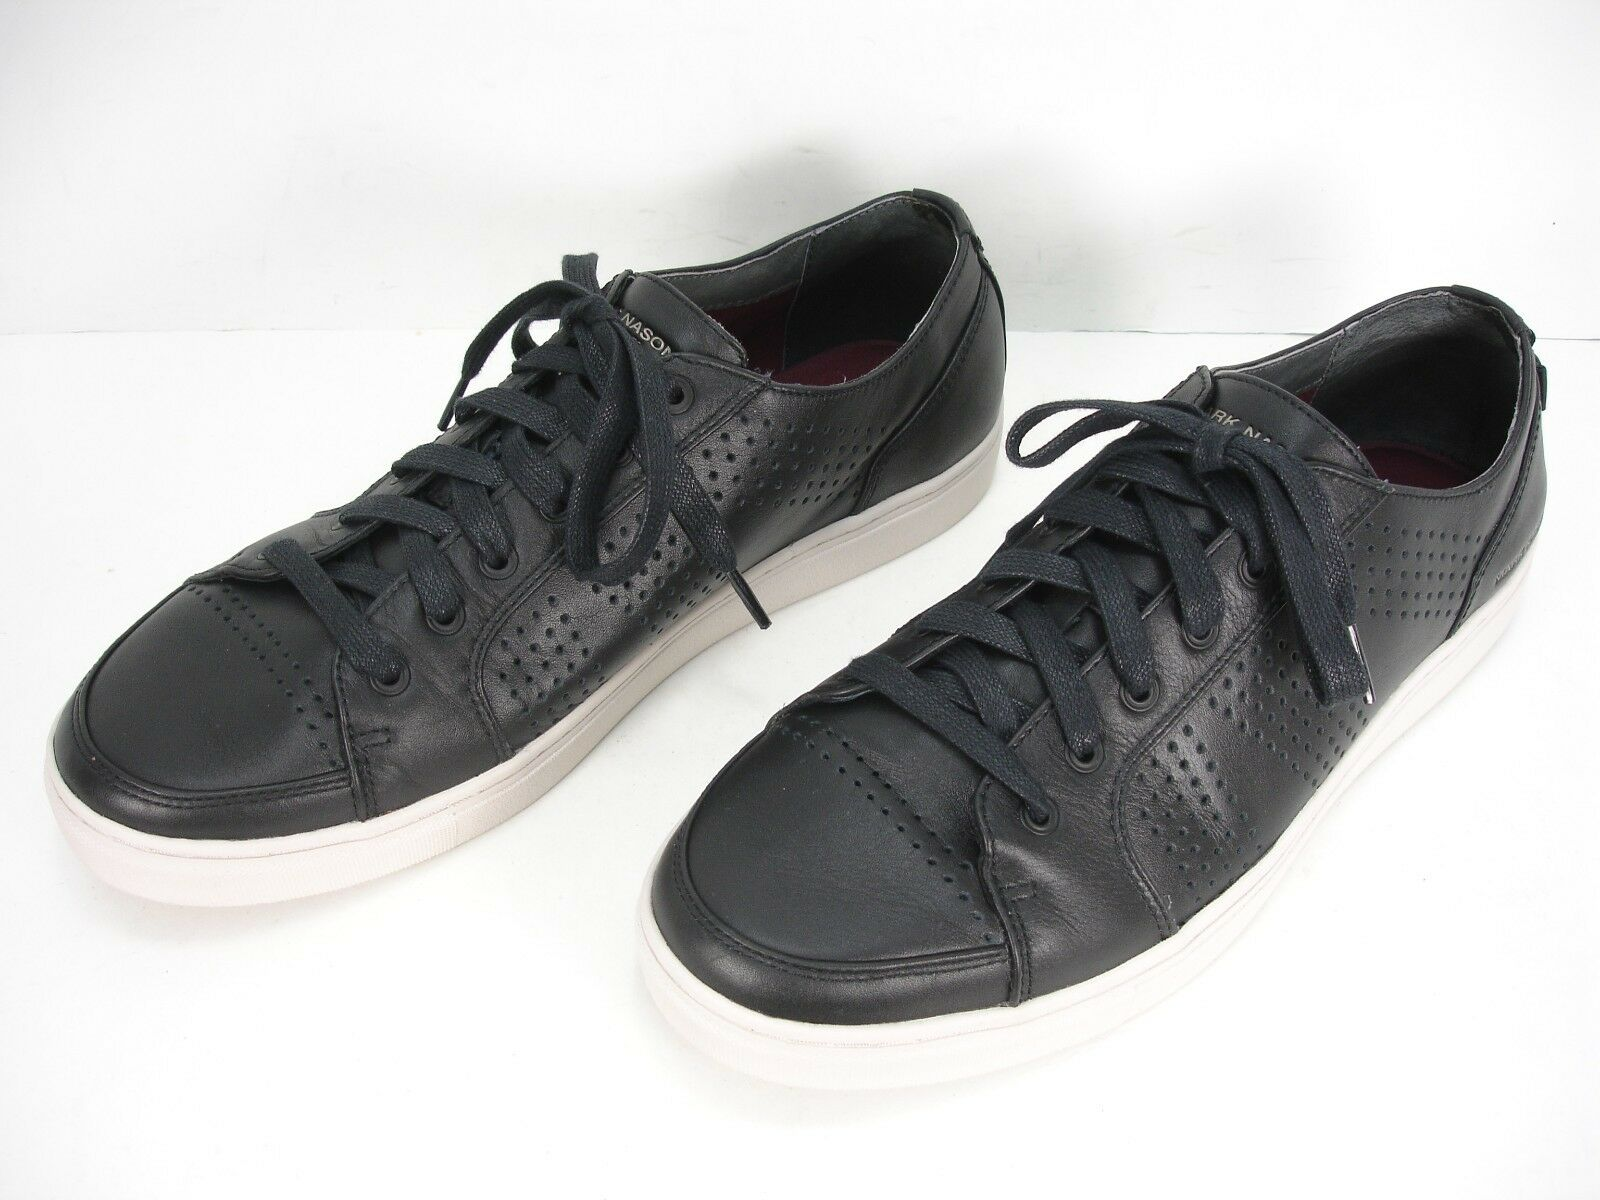 MARK NASON LOS ANGELES Crocker en cuir noir fashion Baskets chaussures Homme 11